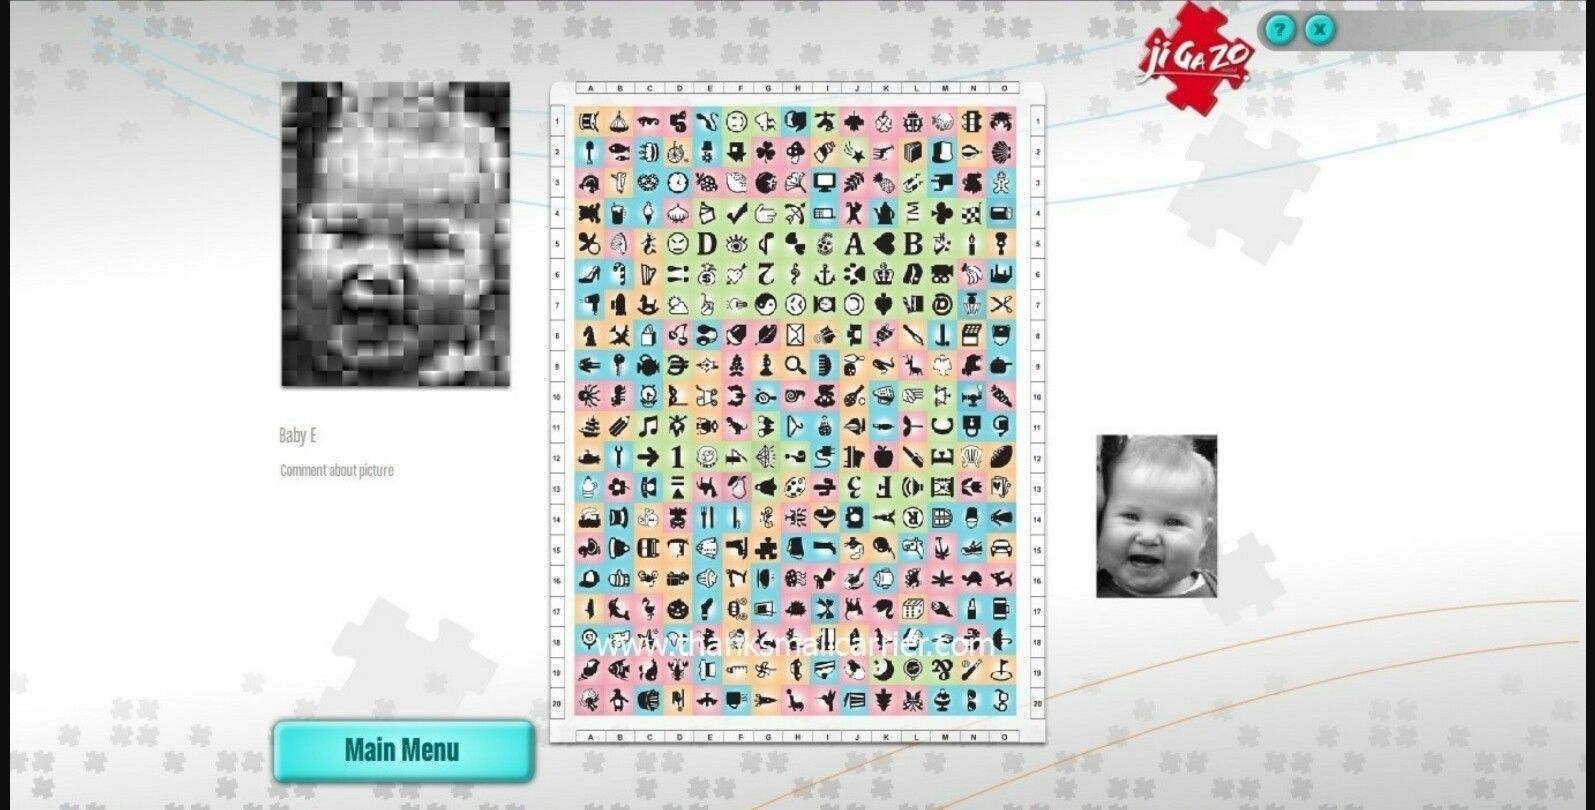 Hasbro Ji Ga Zo Puzzle 300 Piece Sepia Turns Photos Into Puzzles CD ROM Incl NIB